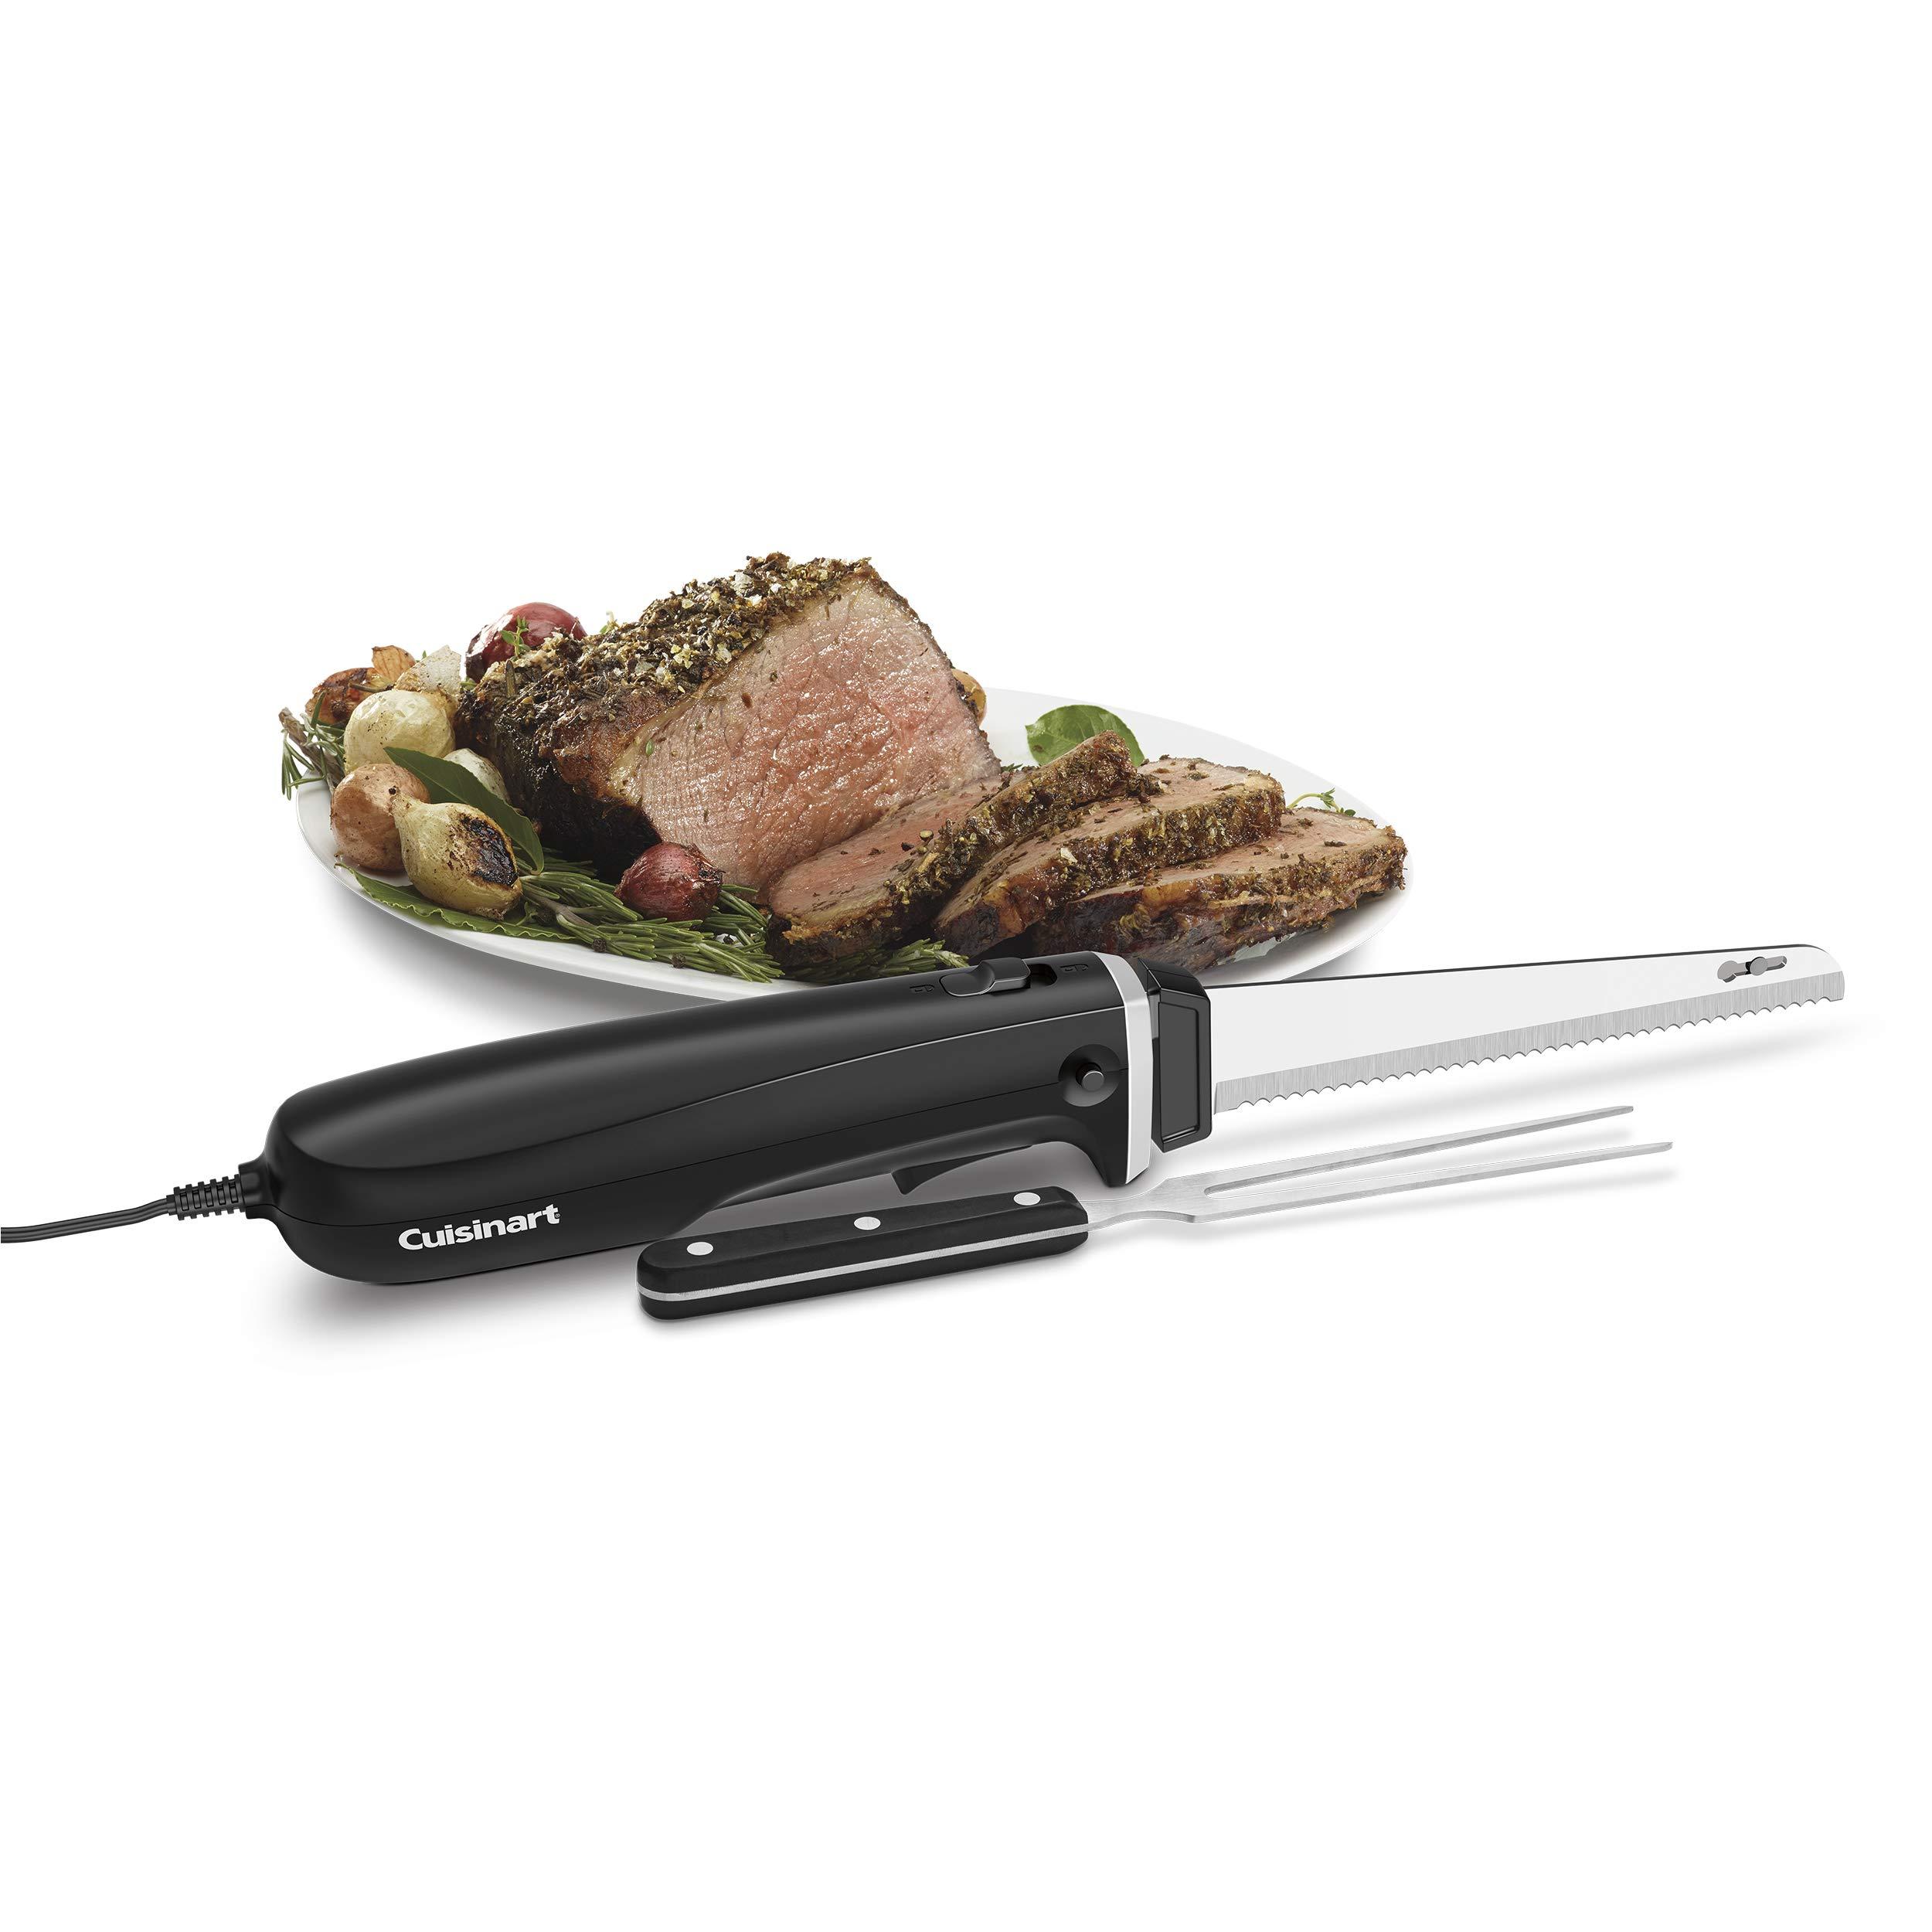 Cuisinart CEK-41 AC Electric Knife, One Size, Black by Cuisinart